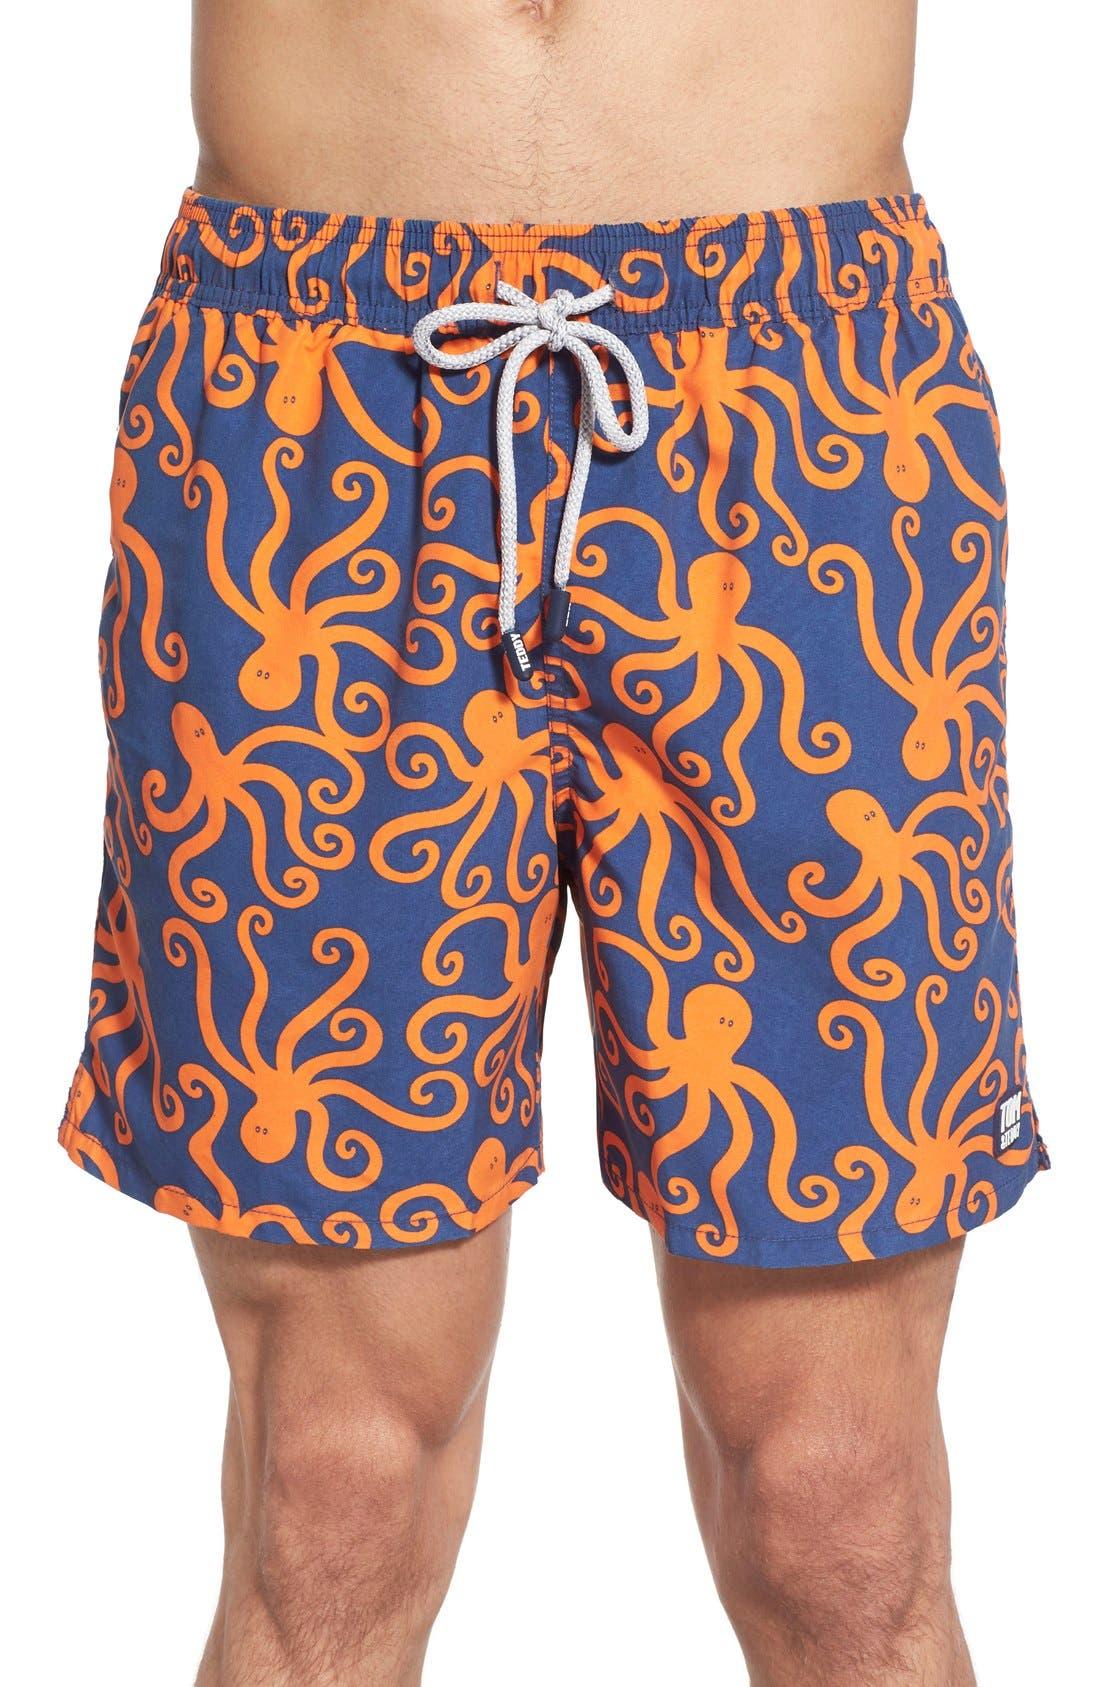 'Octopus Pattern' Swim Trunks, Main, color, BLUE/ ORANGE